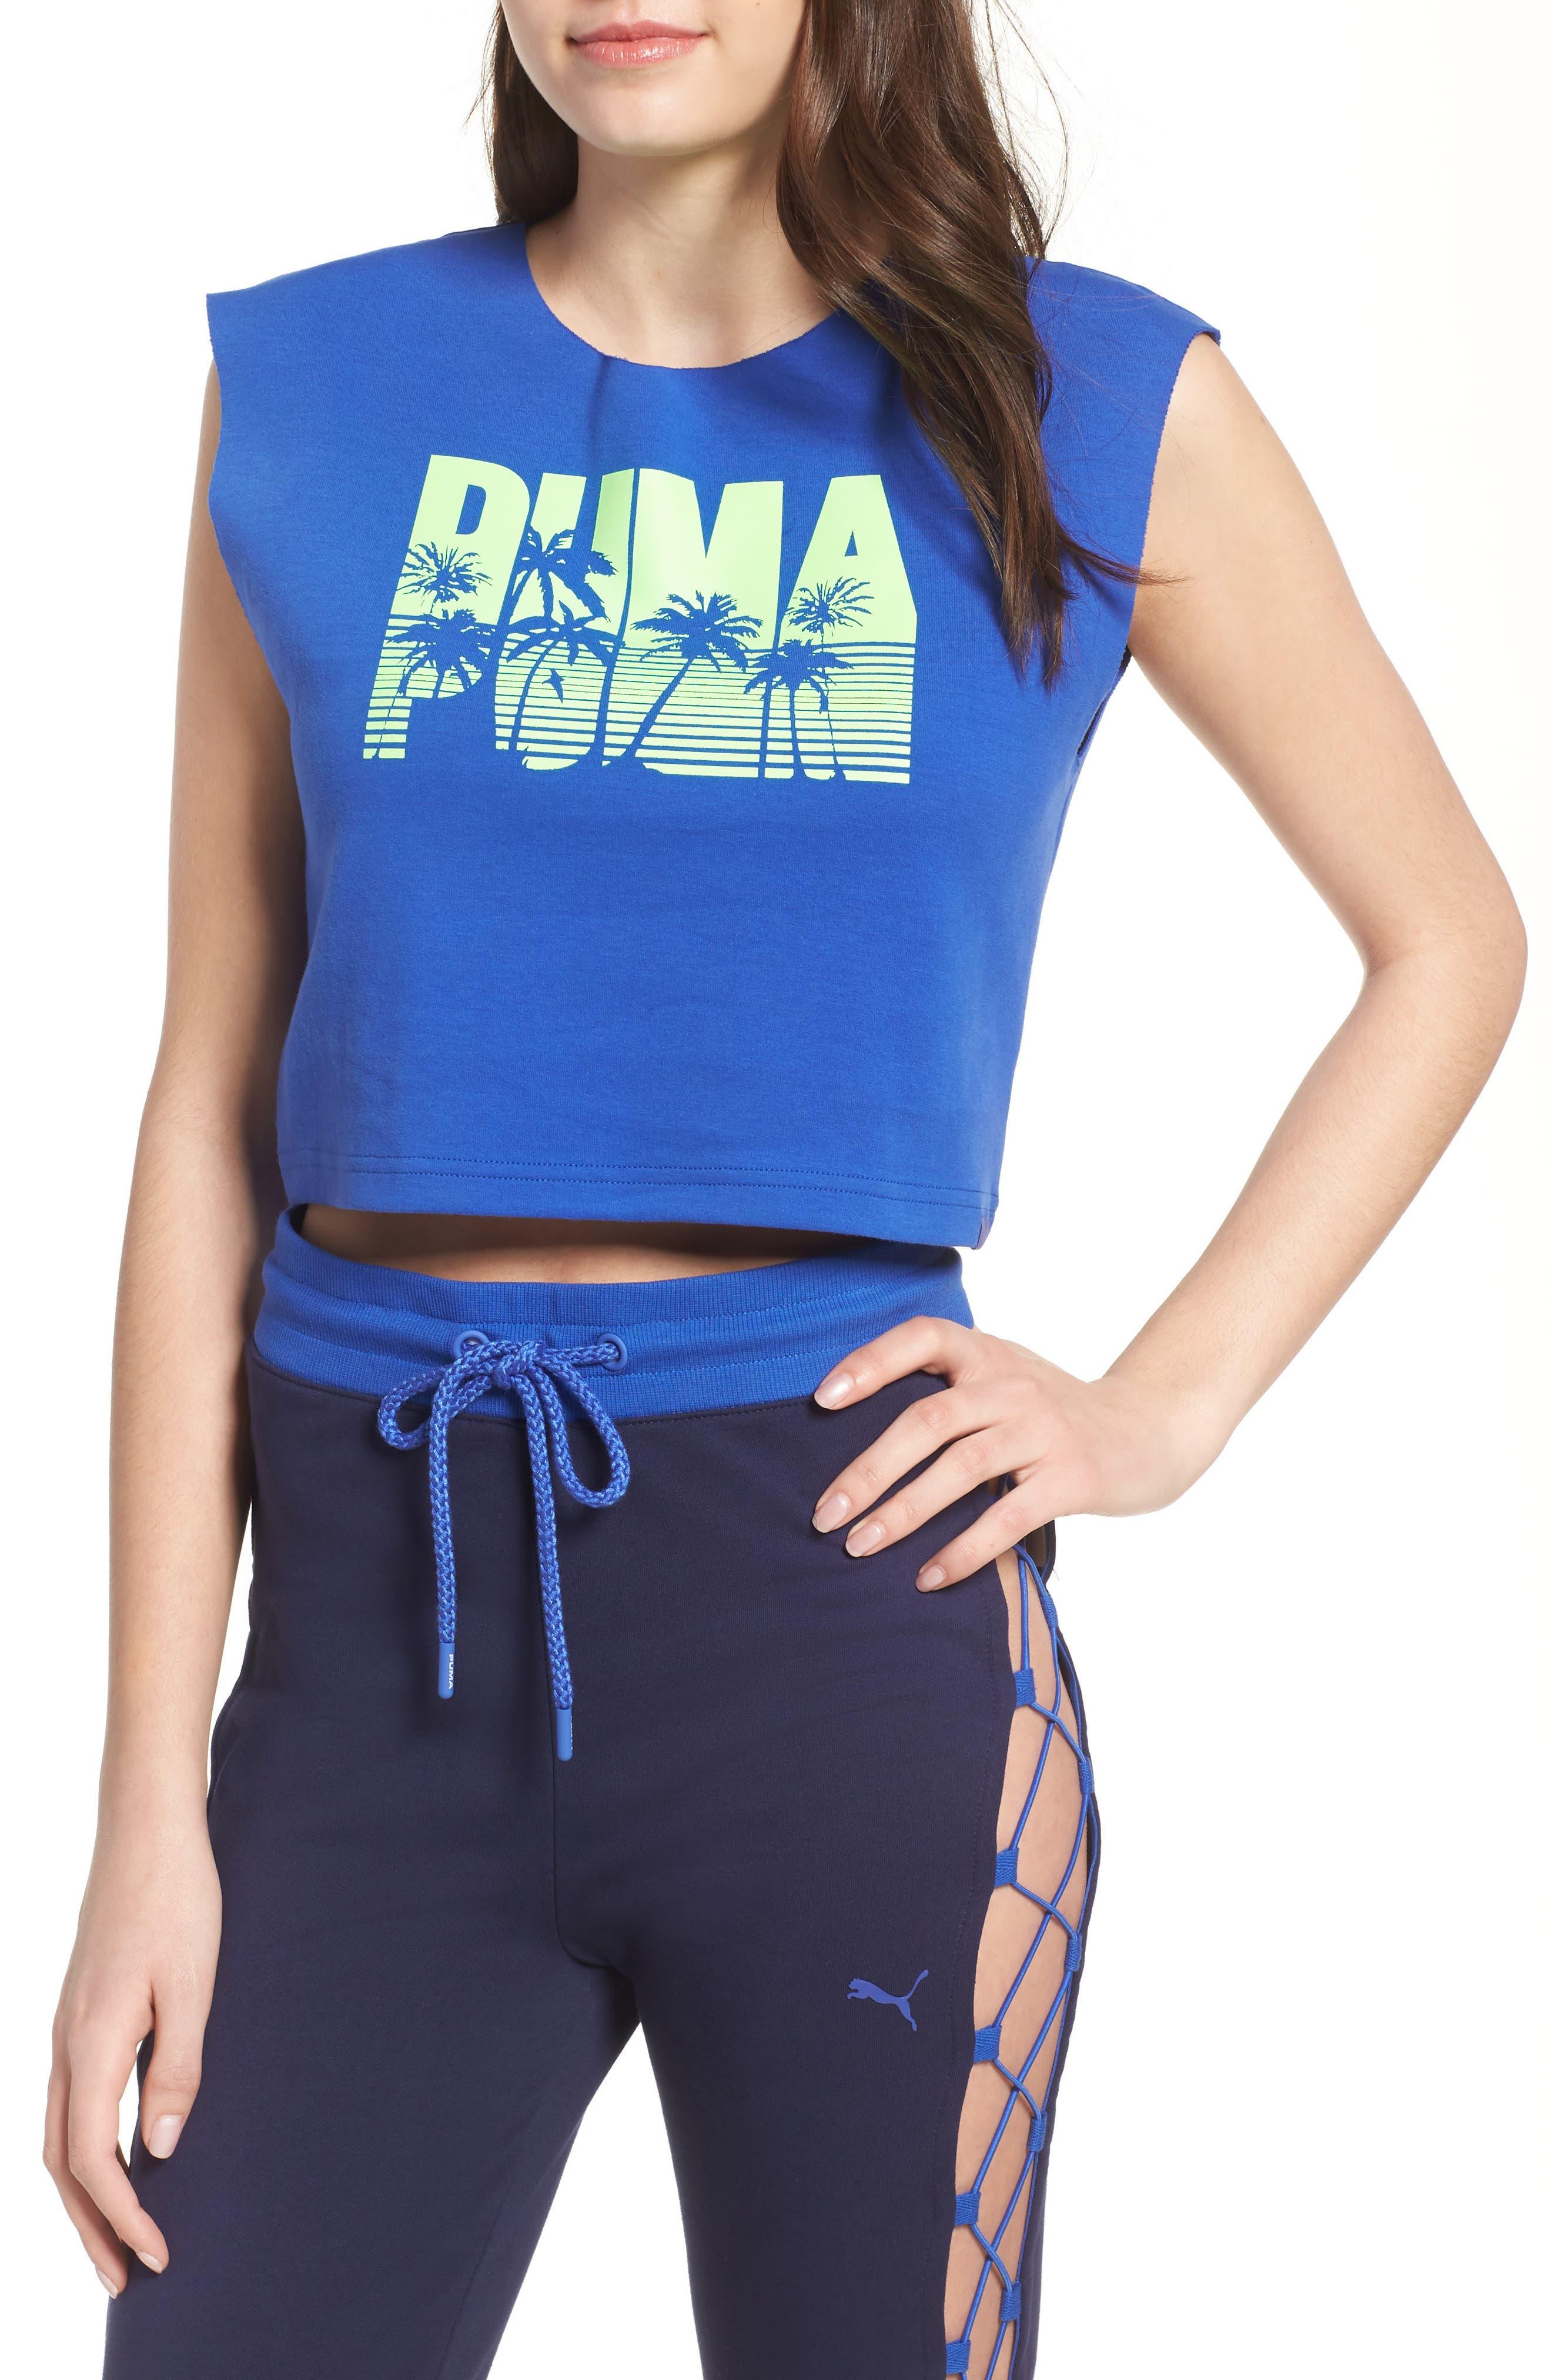 PUMA,                             FENTY PUMA by Rihanna Logo Crop Top,                             Main thumbnail 1, color,                             400